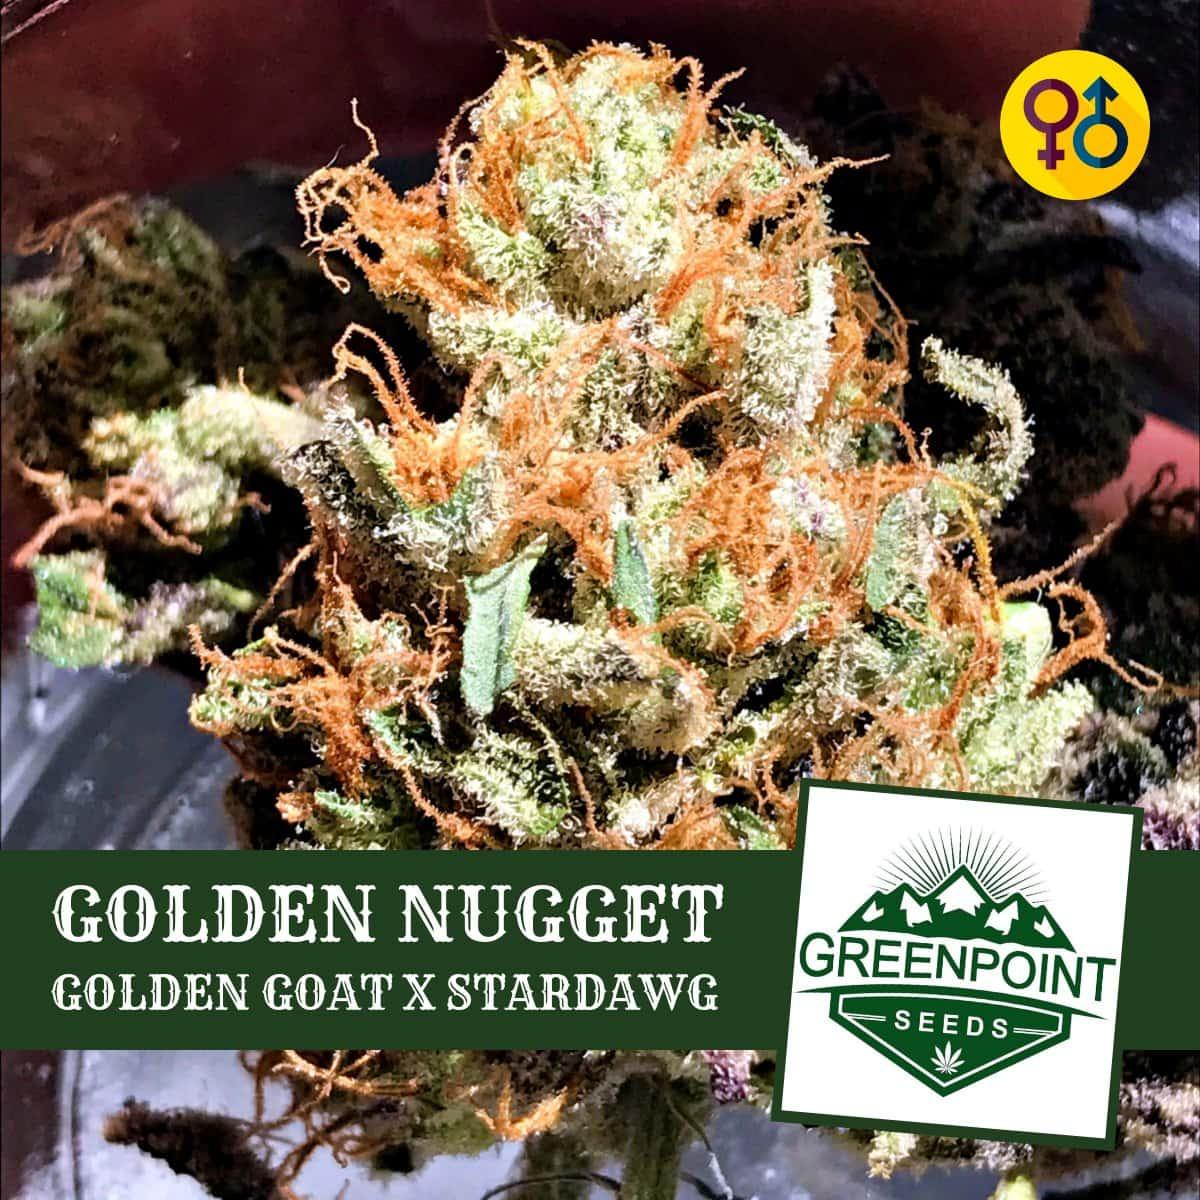 Golden Nugget - Golden Goat X Stardawg | Greenpoint Seeds